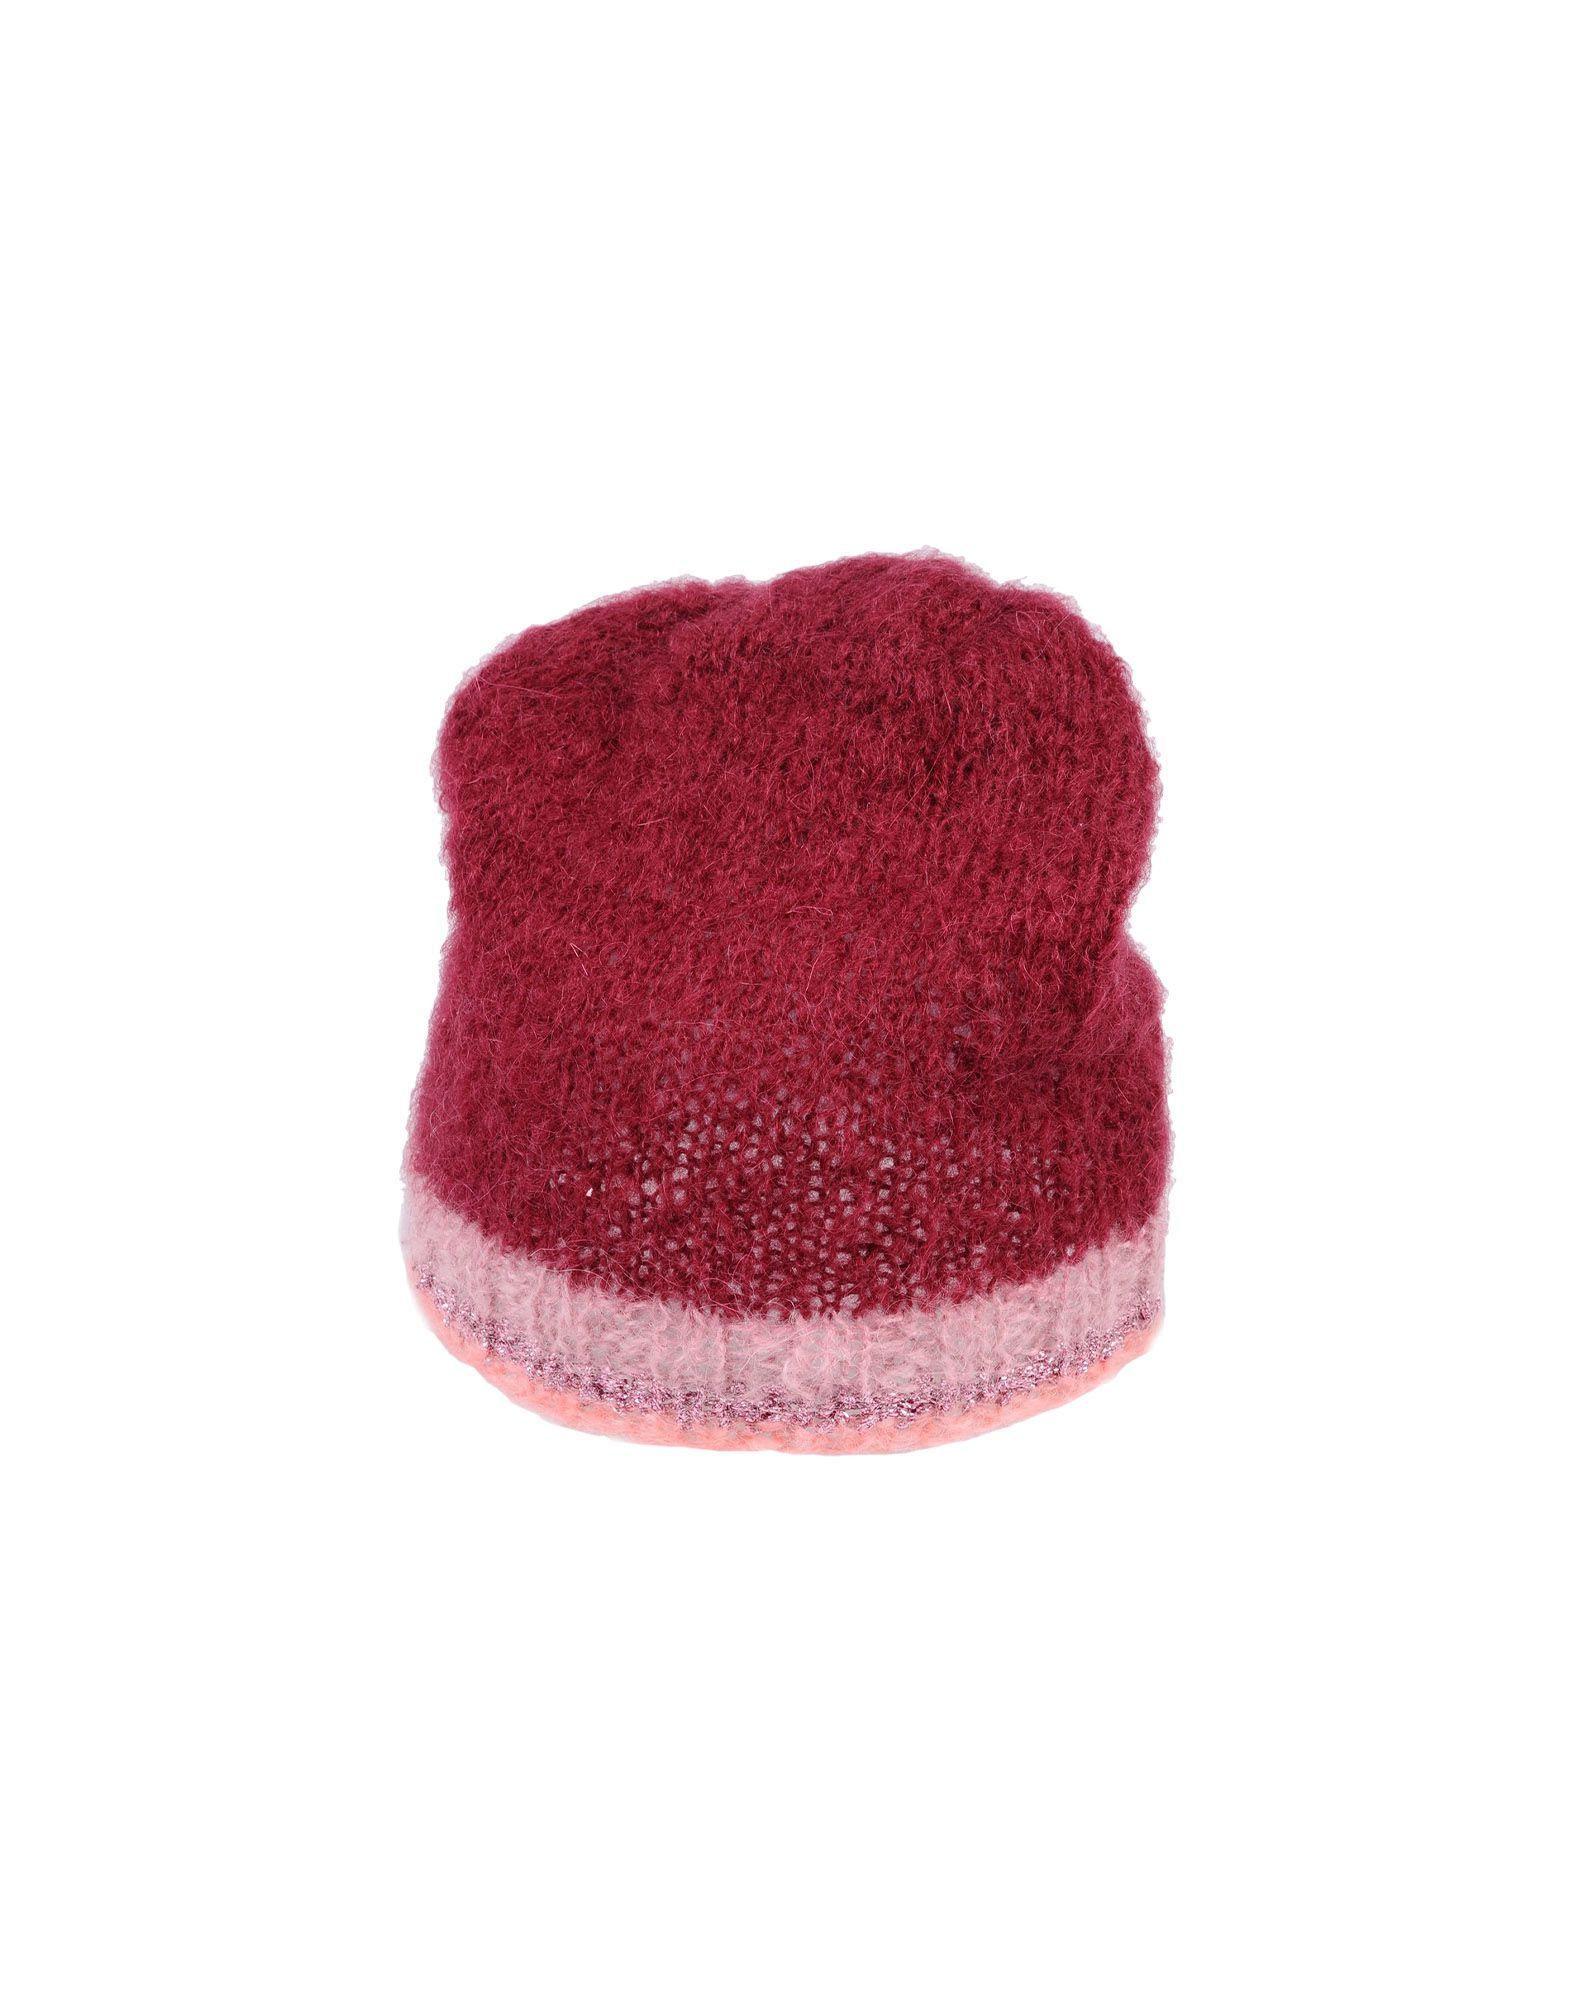 ROSE CARMINE Головной убор сумка складная reisenthel mini maxi pocket carmine rose